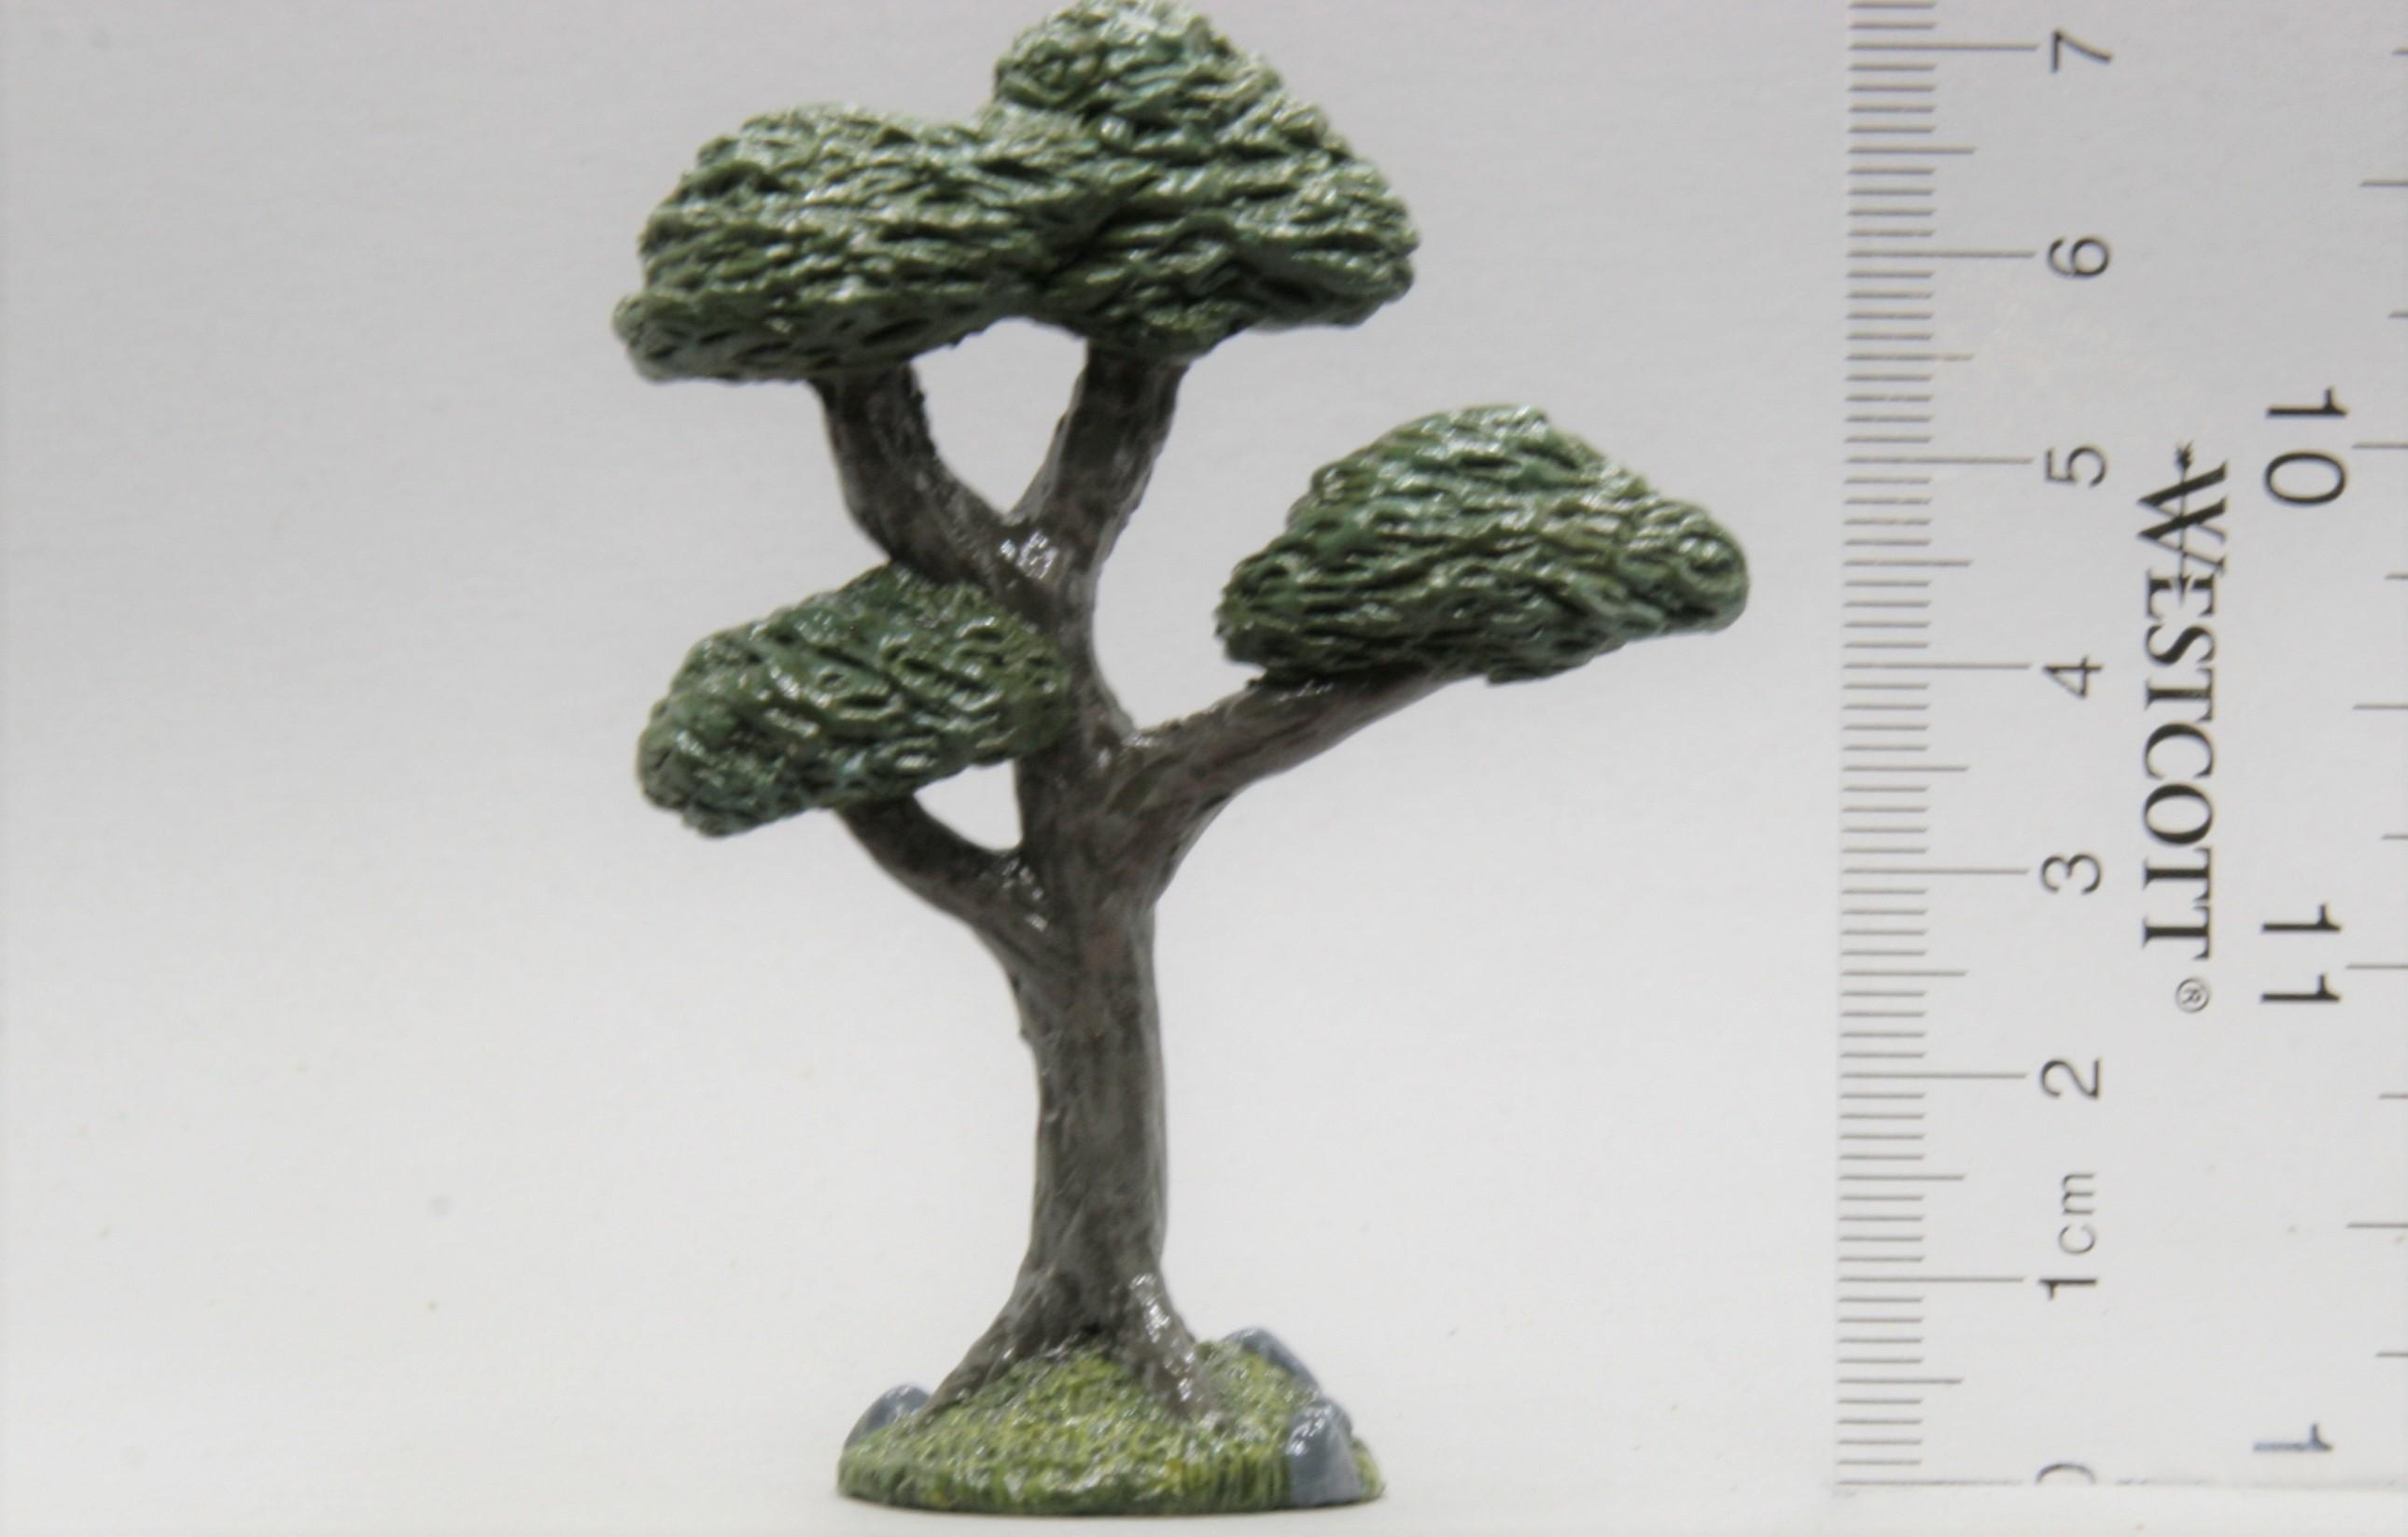 Tall Tree painted